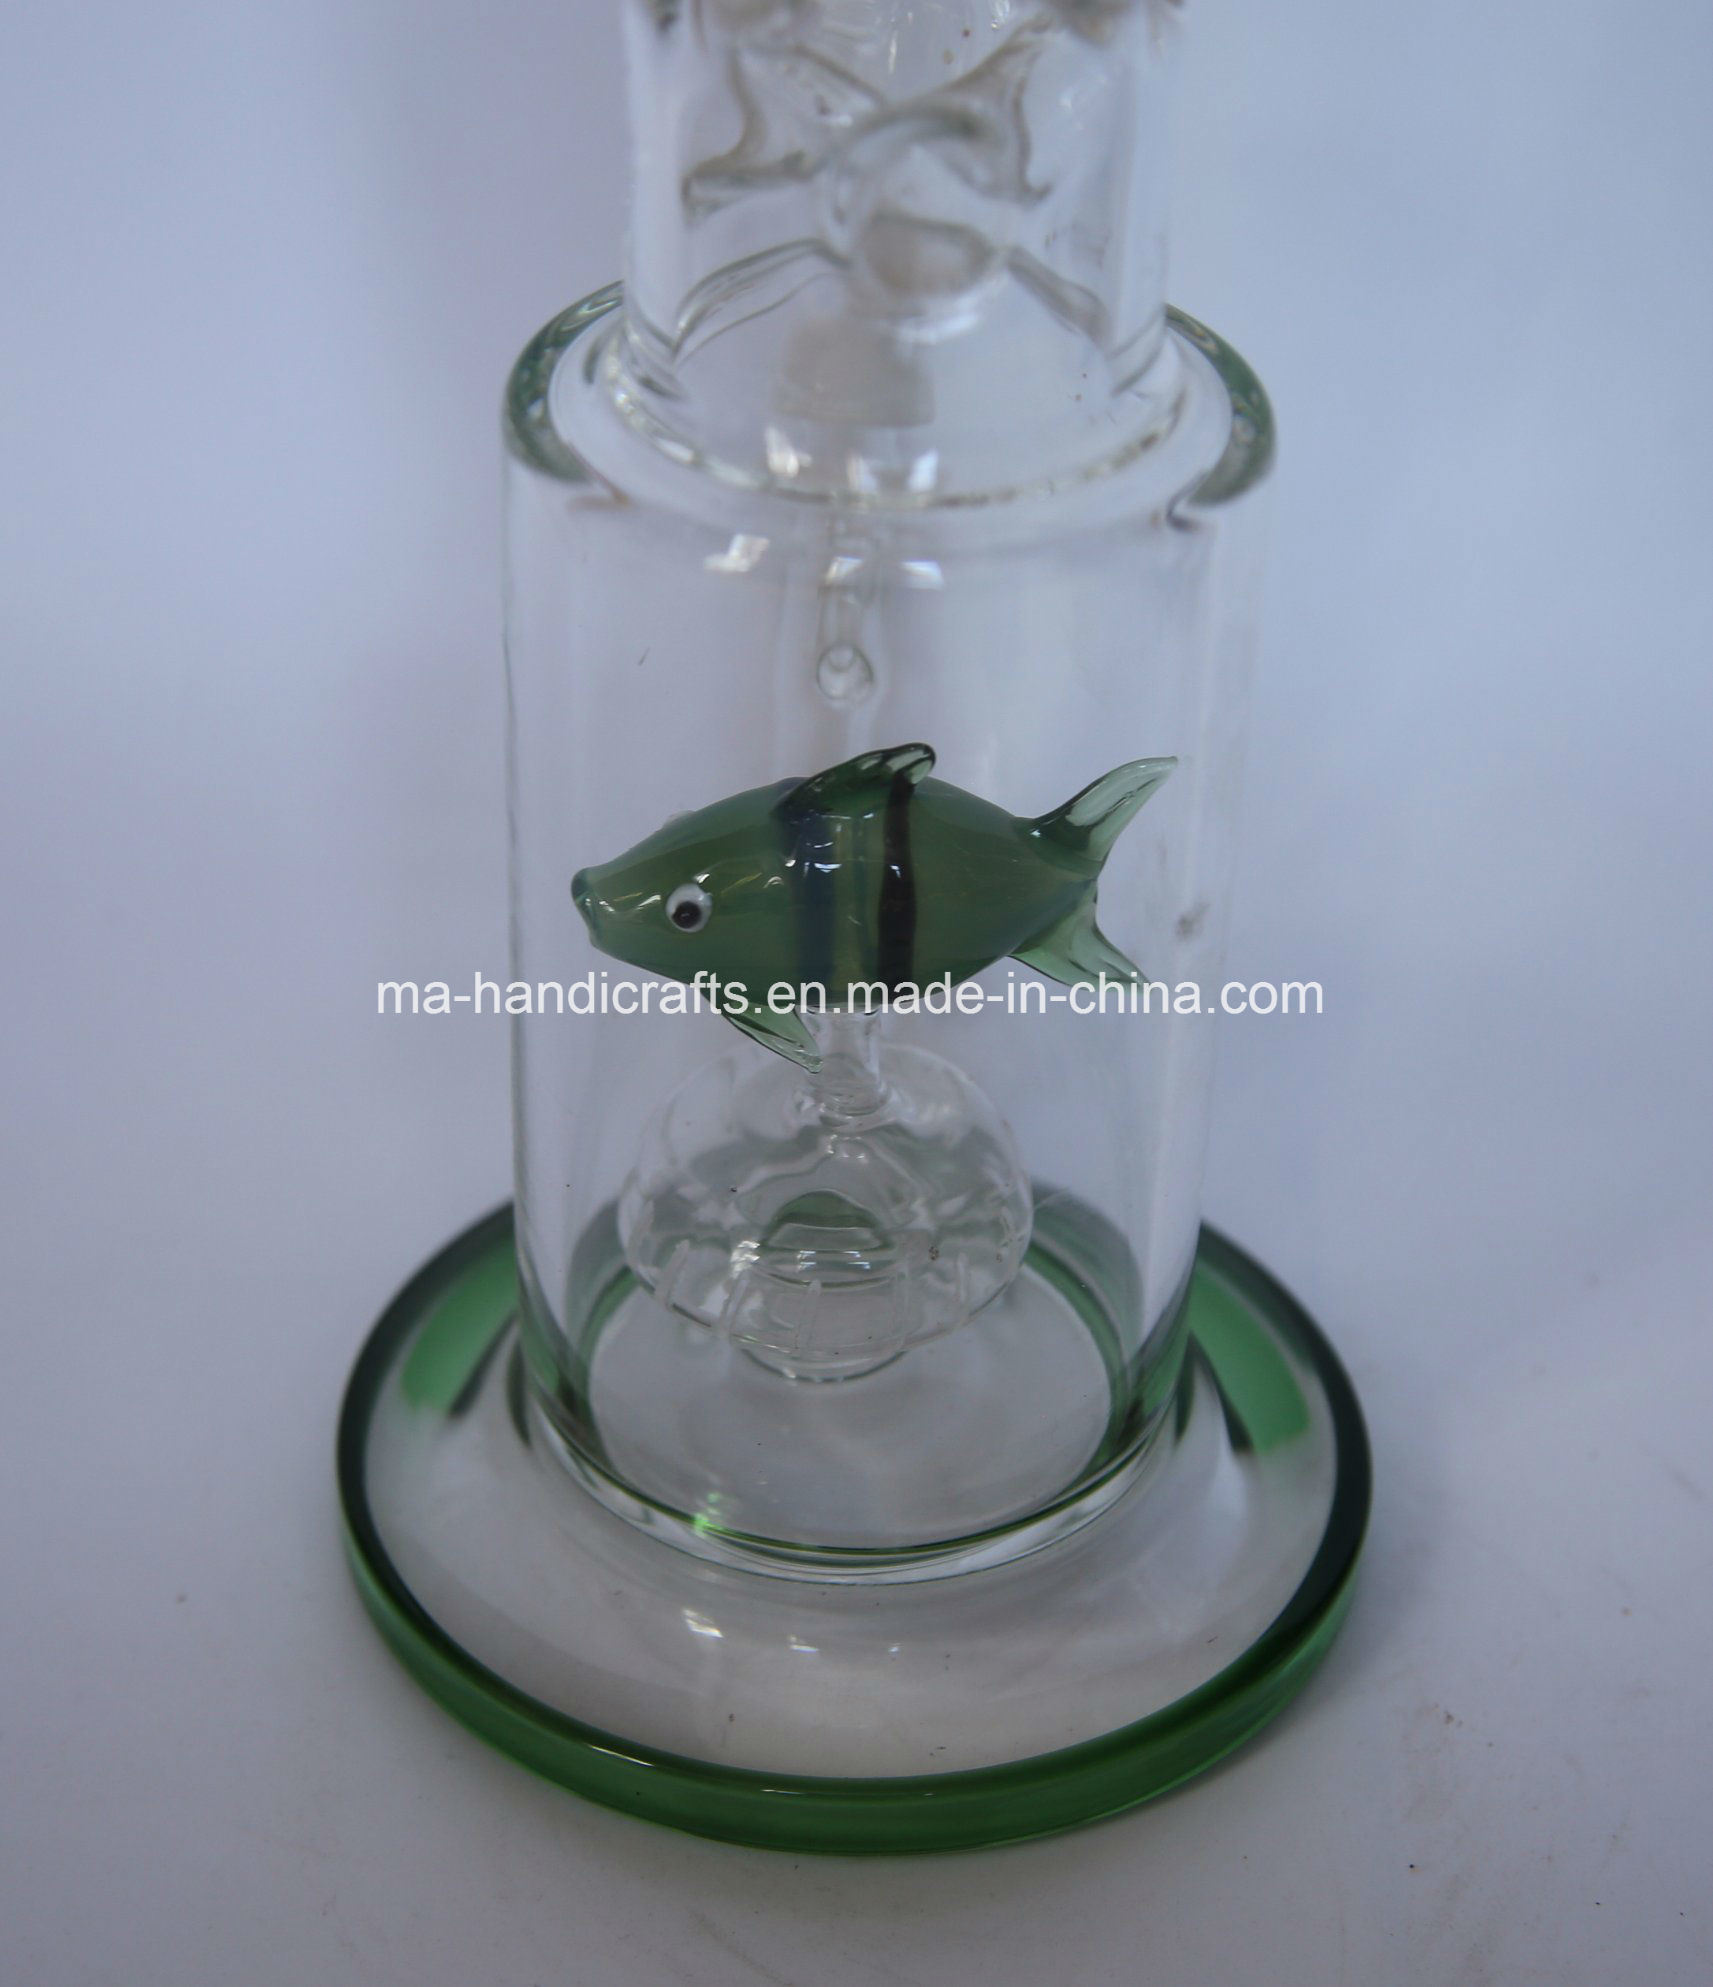 "17"" Green Glass Smoking Water Pipes Shisha with Fish Perc"